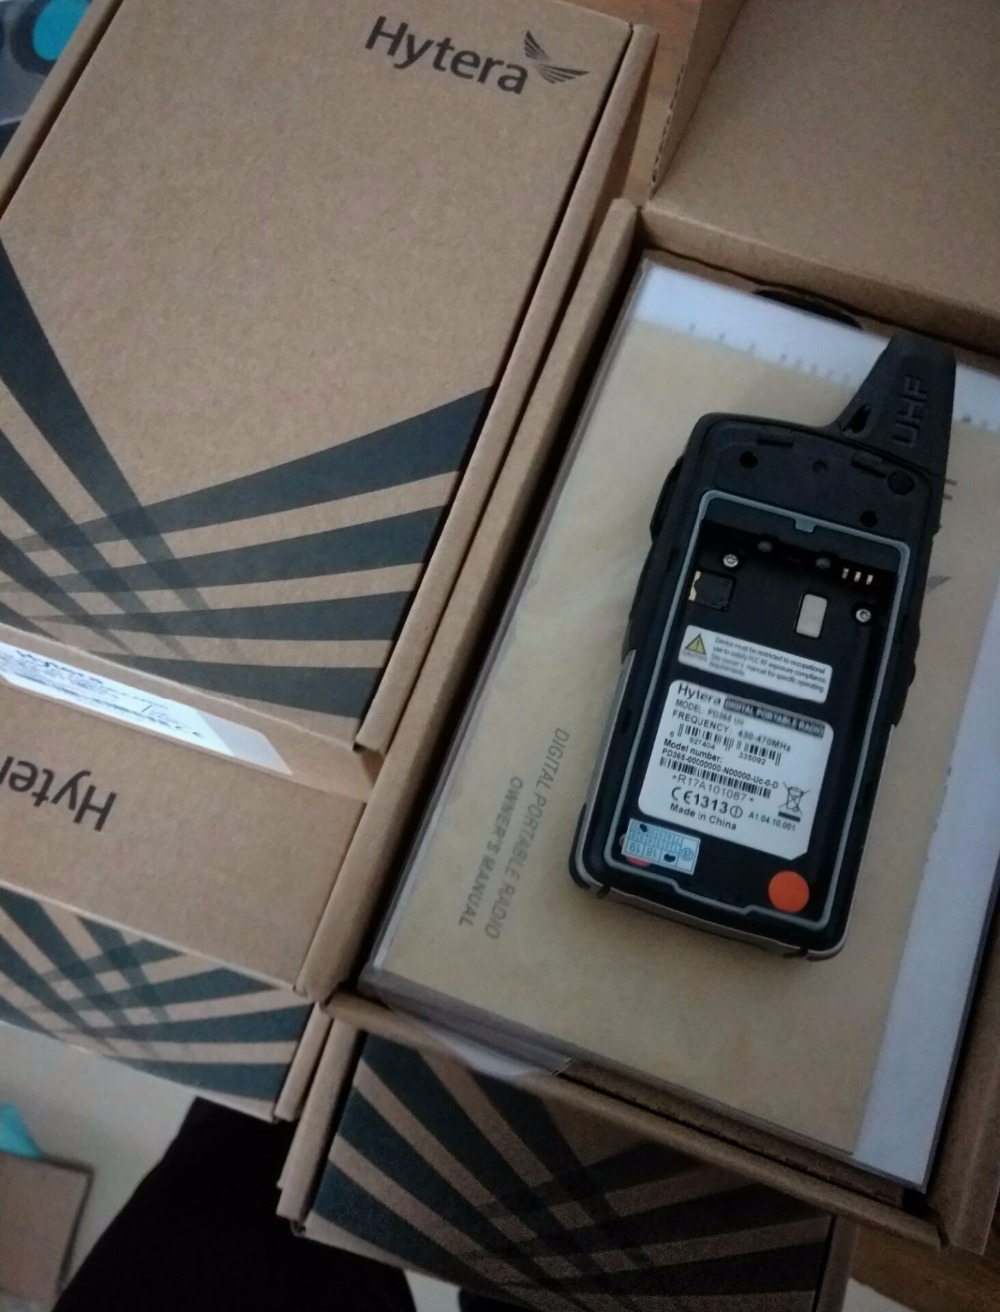 Hytera PD365 walkie talkie sql динамик USB зарядное устройство 400 440 МГц 430 470 МГц цифровое двухстороннее радио 256CH портативное радио для охоты